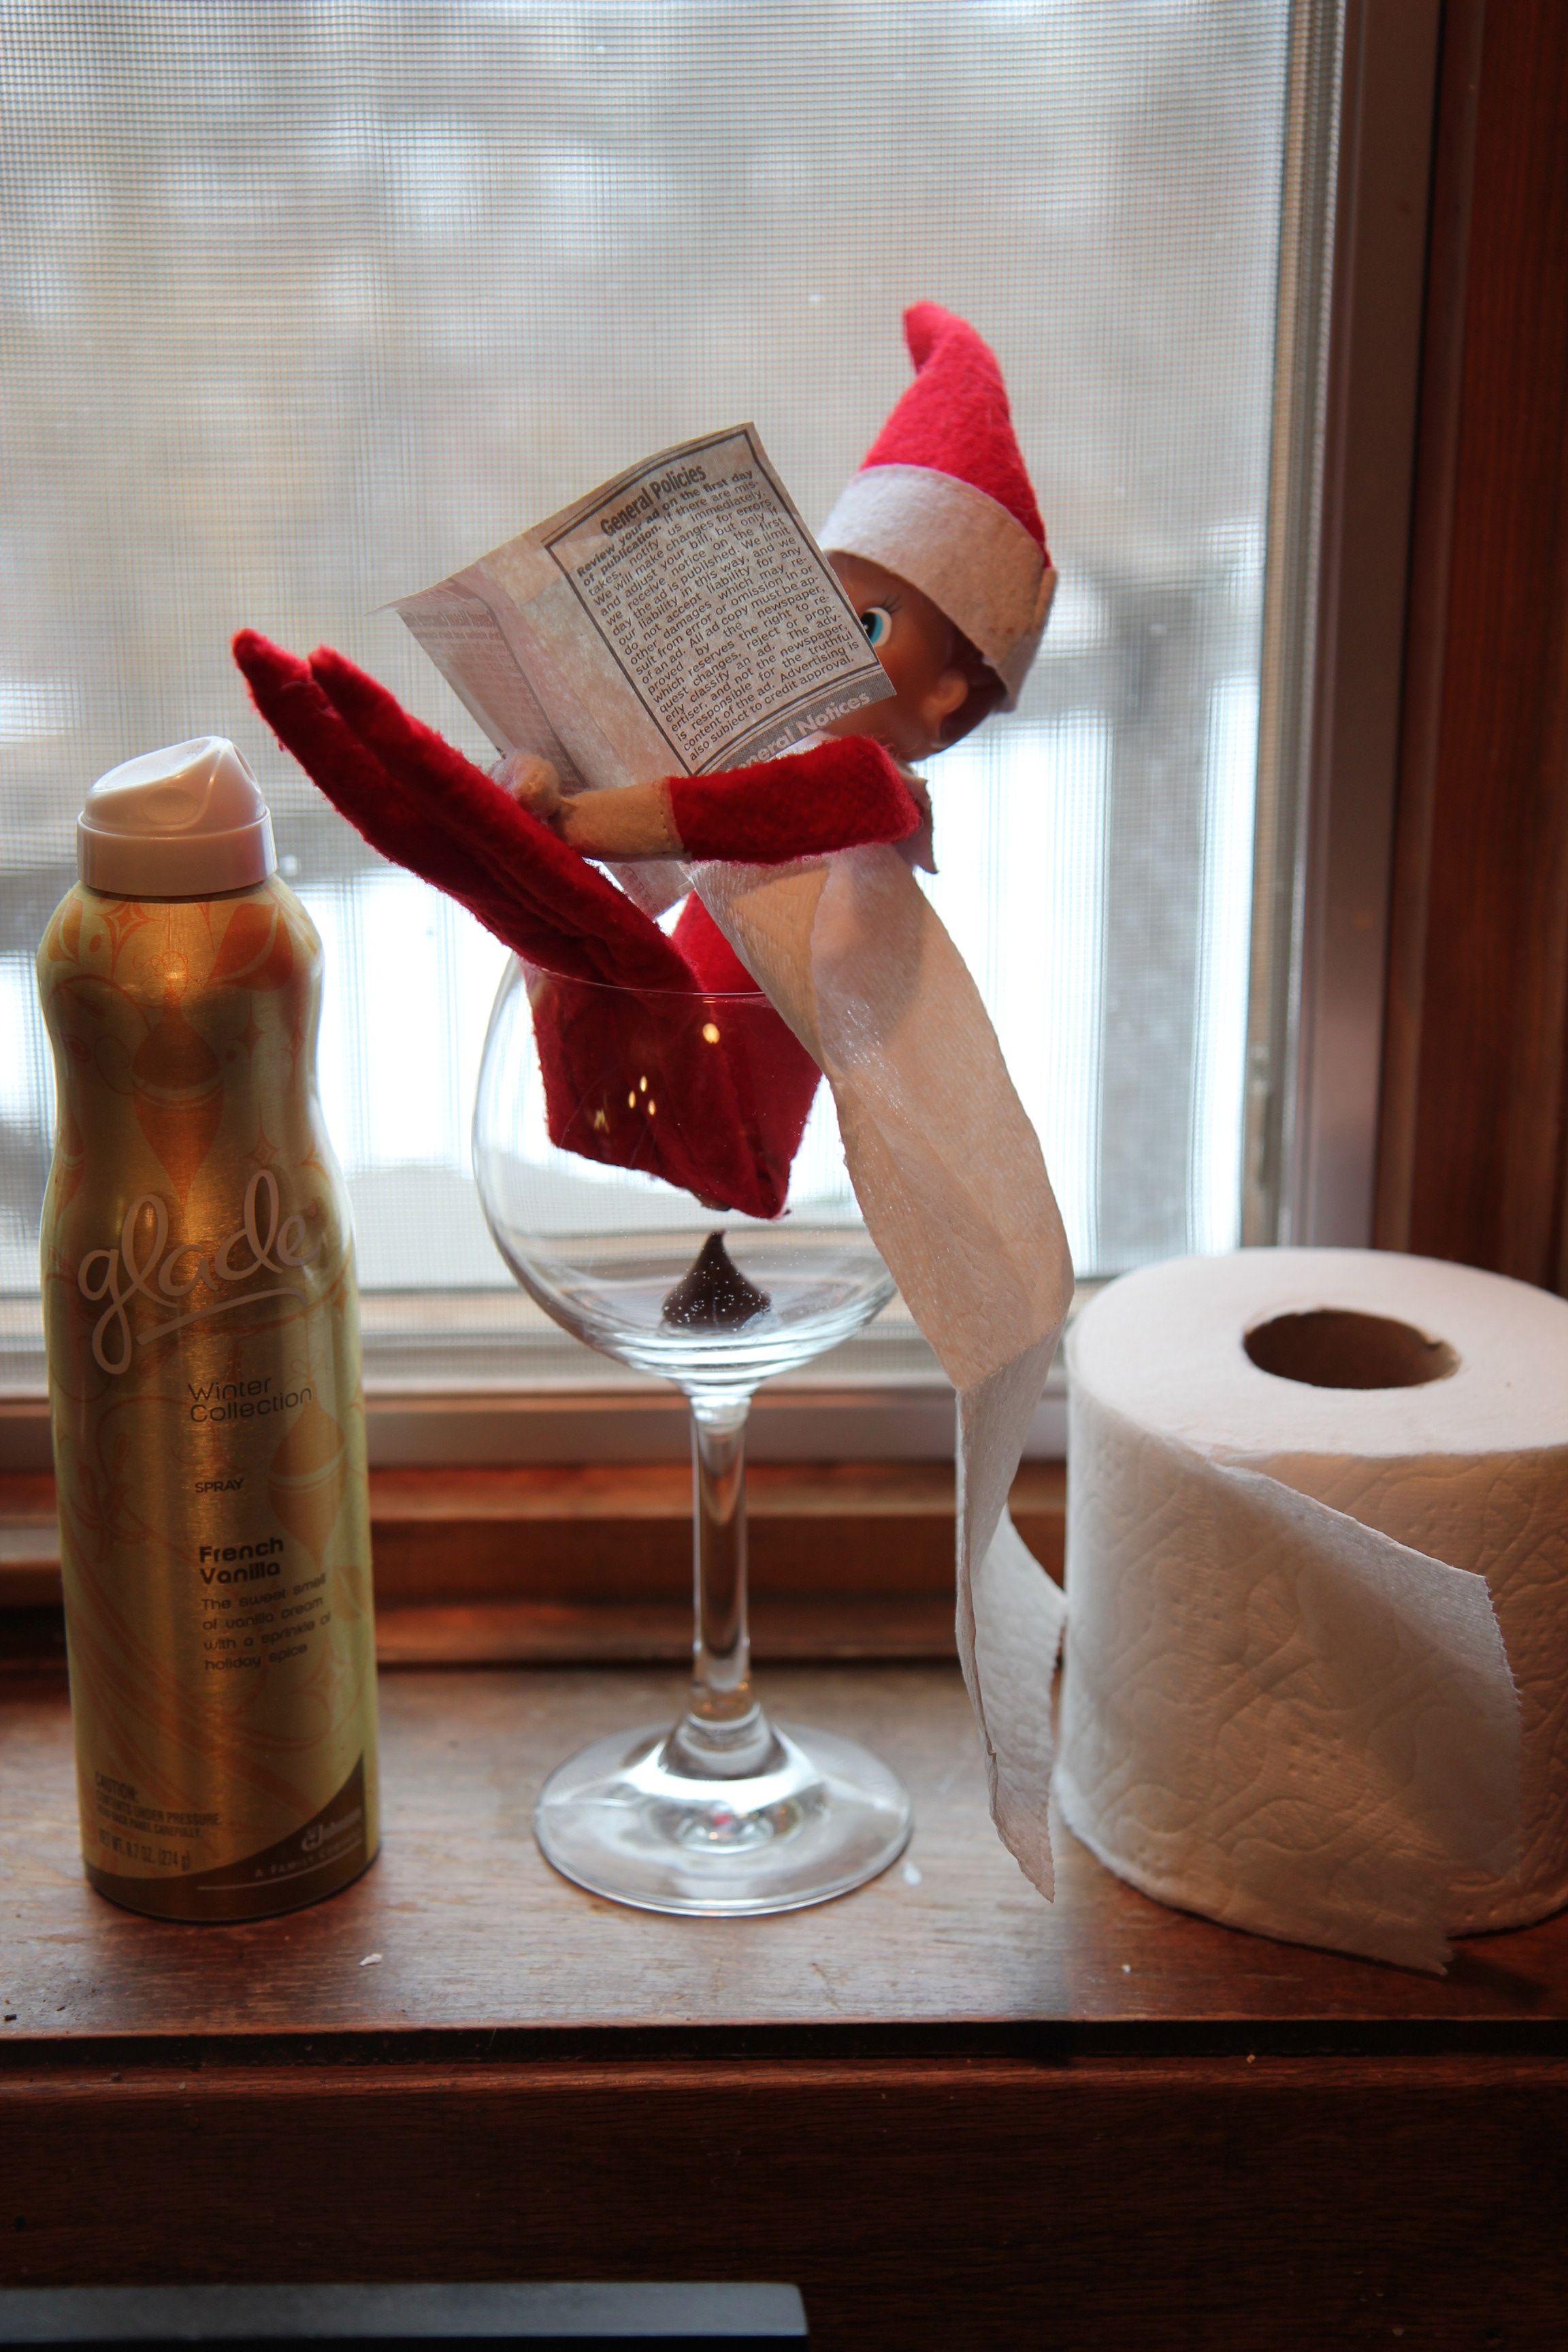 Top 50 elf on the shelf ideas i heart nap time - 25 Funny Elf On The Shelf Ideas Elfontheshelf Naughtyelf